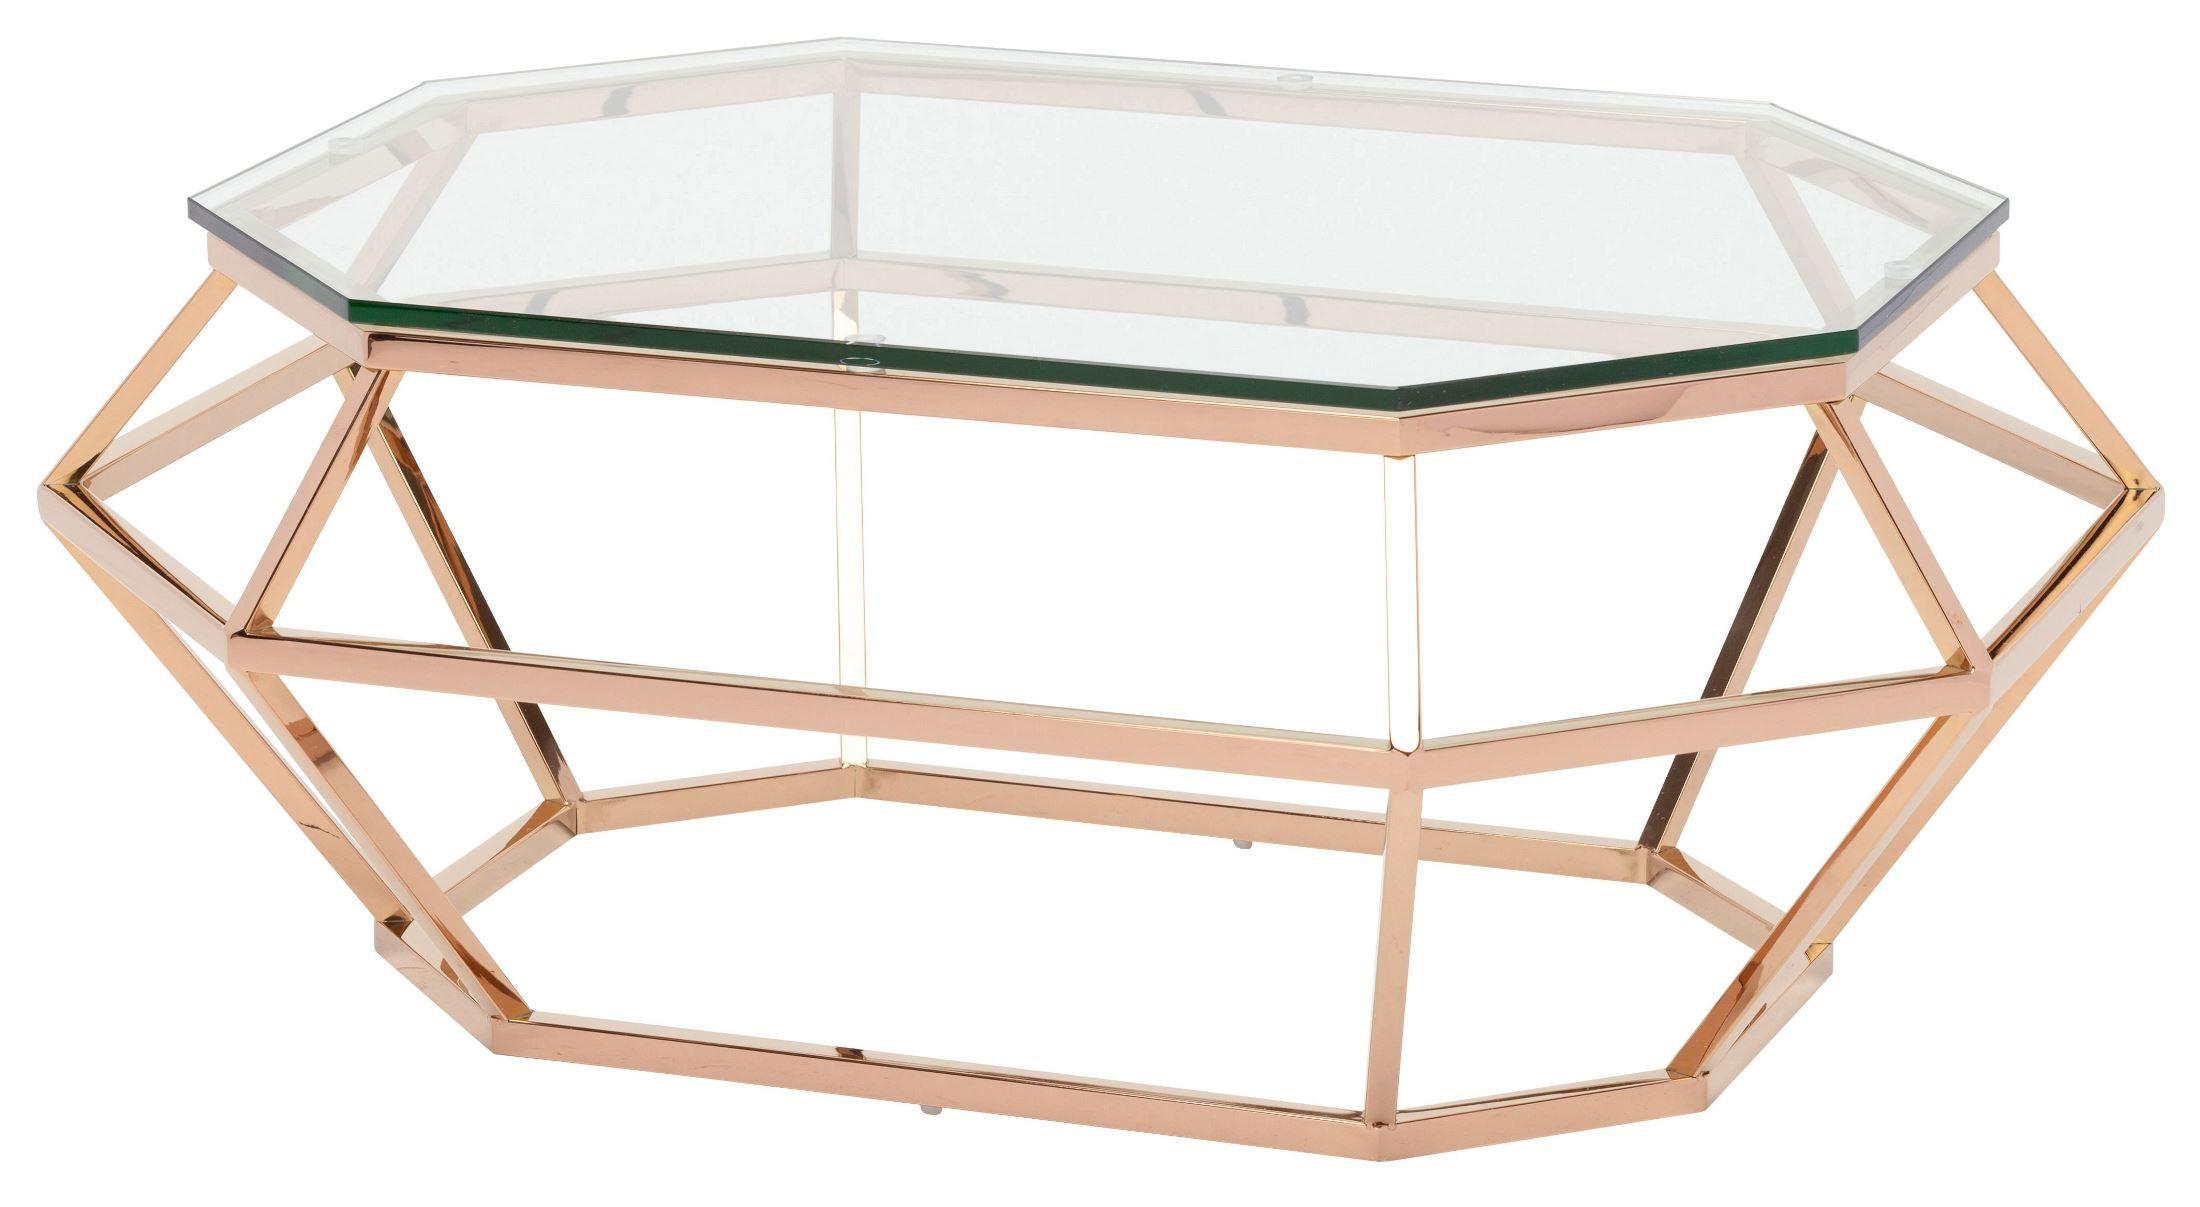 Diamond Clear Glass Coffee Table Hgsx185 Nuevo